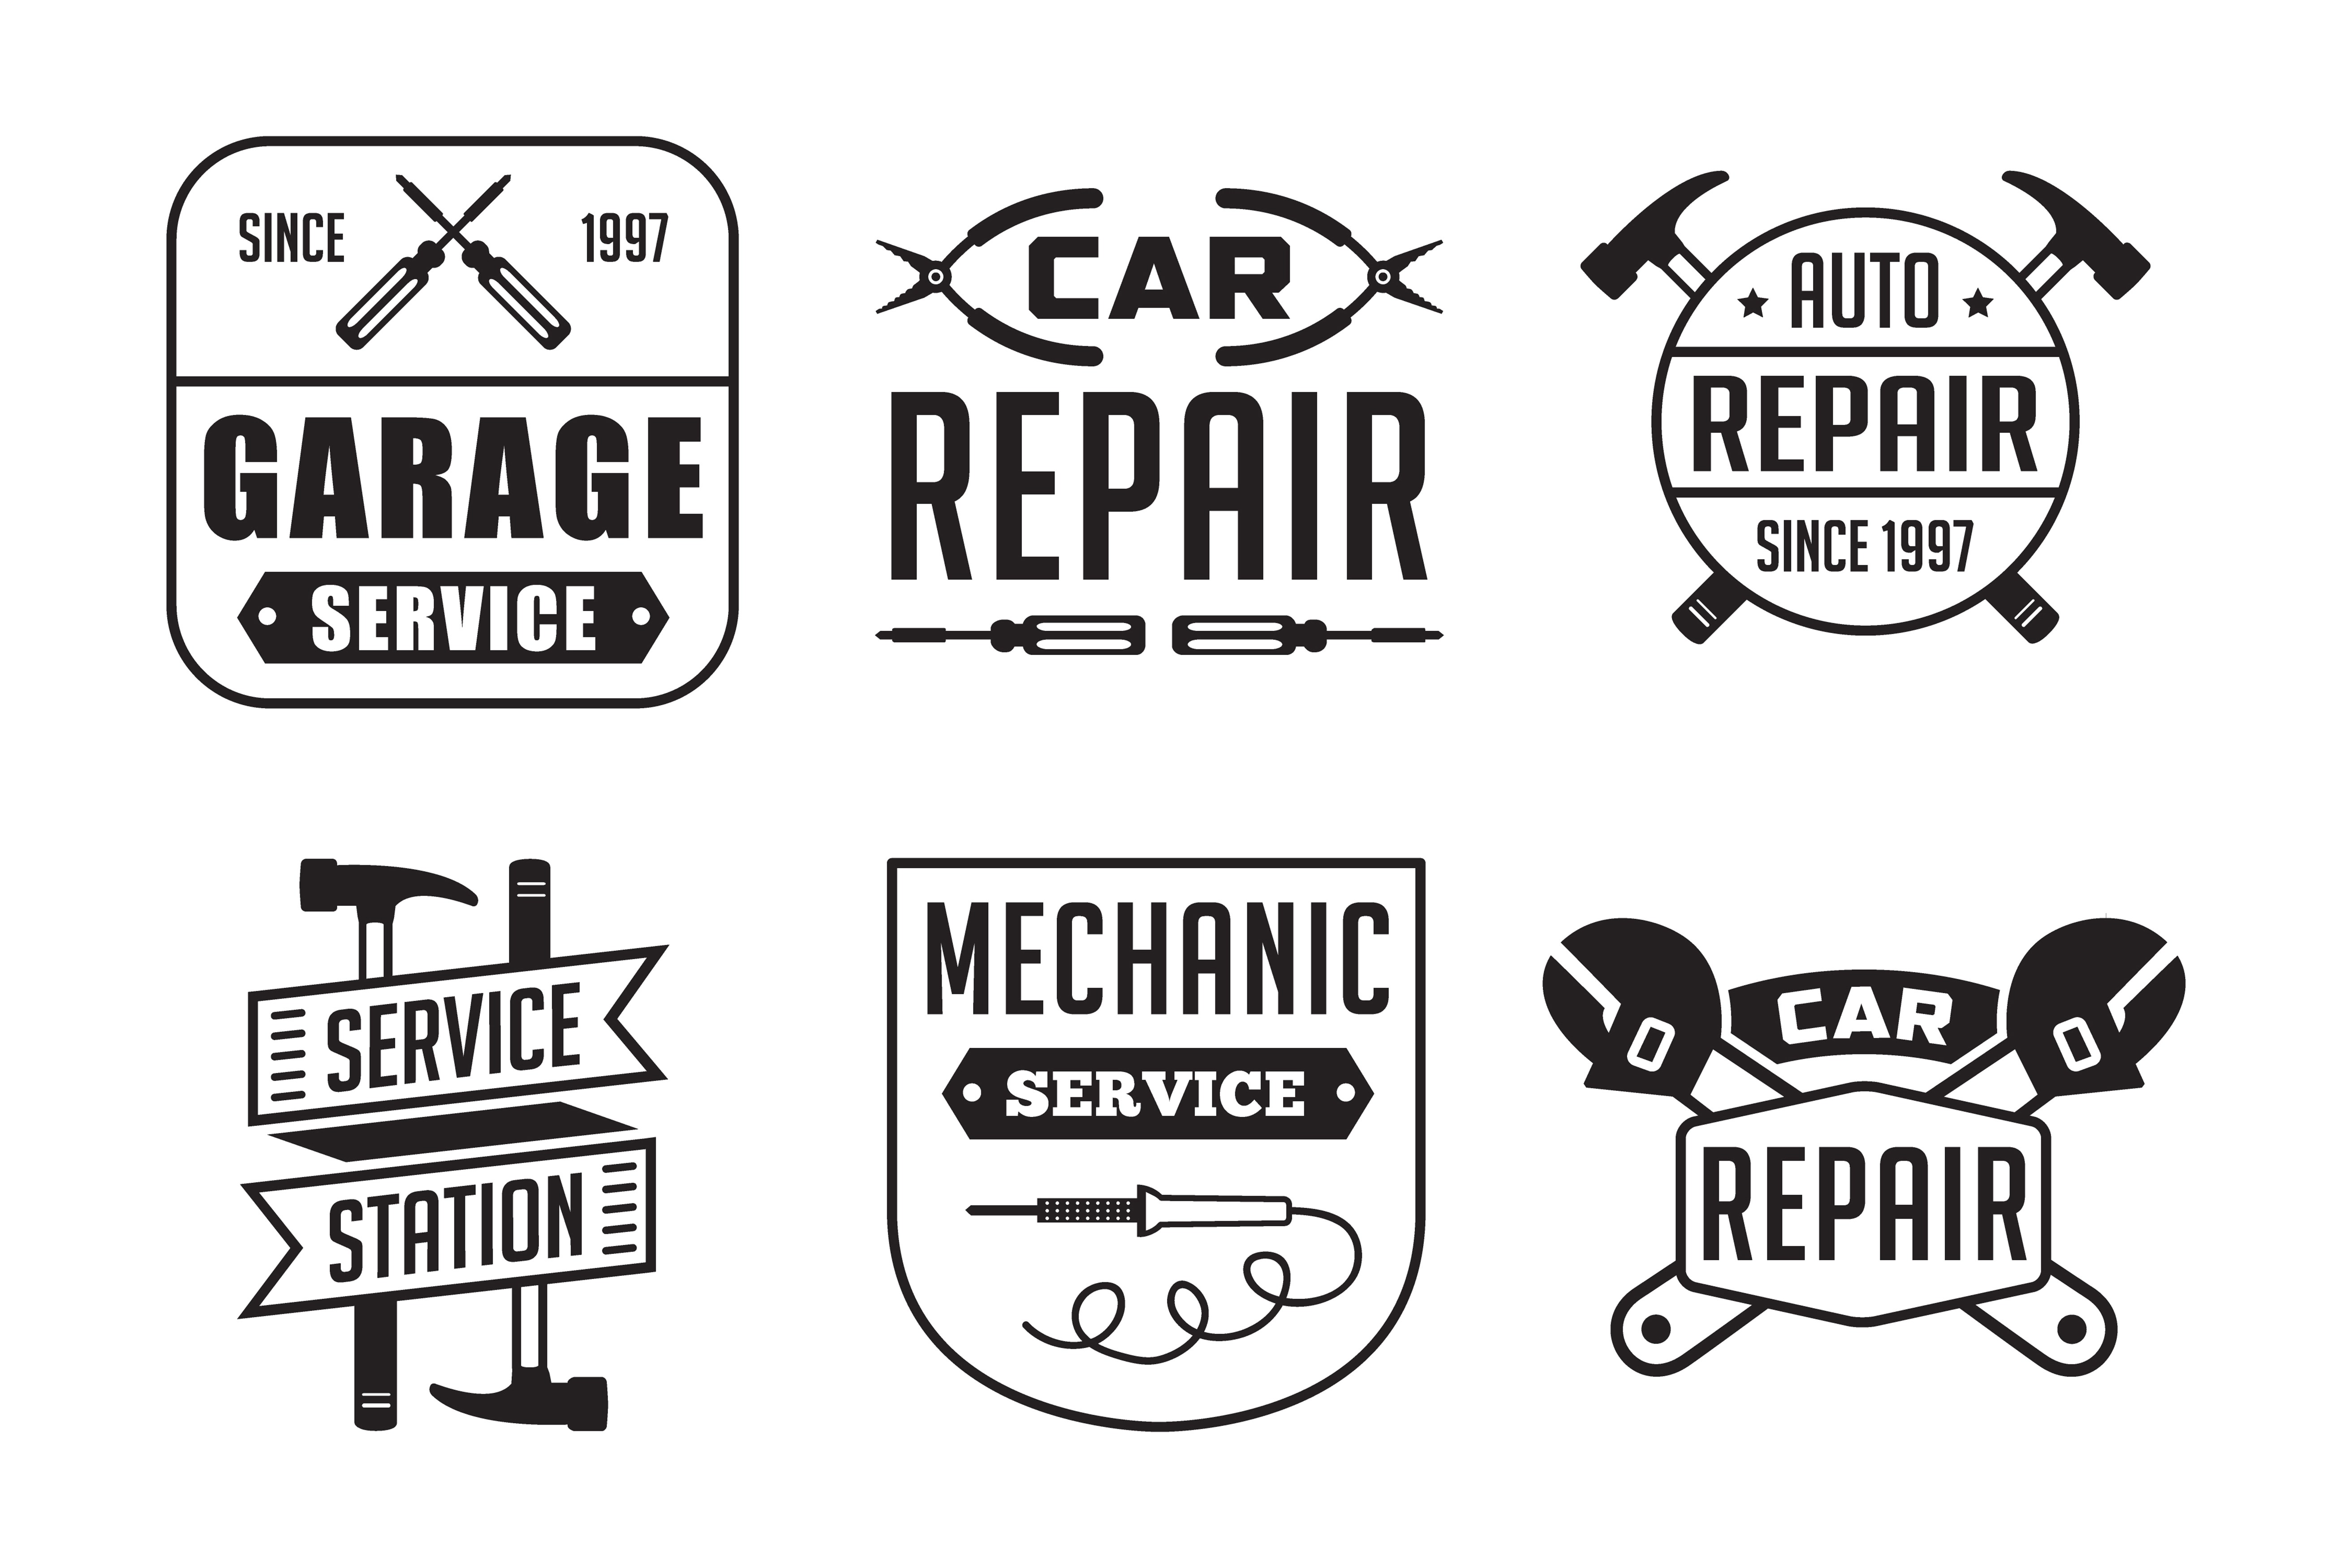 Automotive Service Record Template